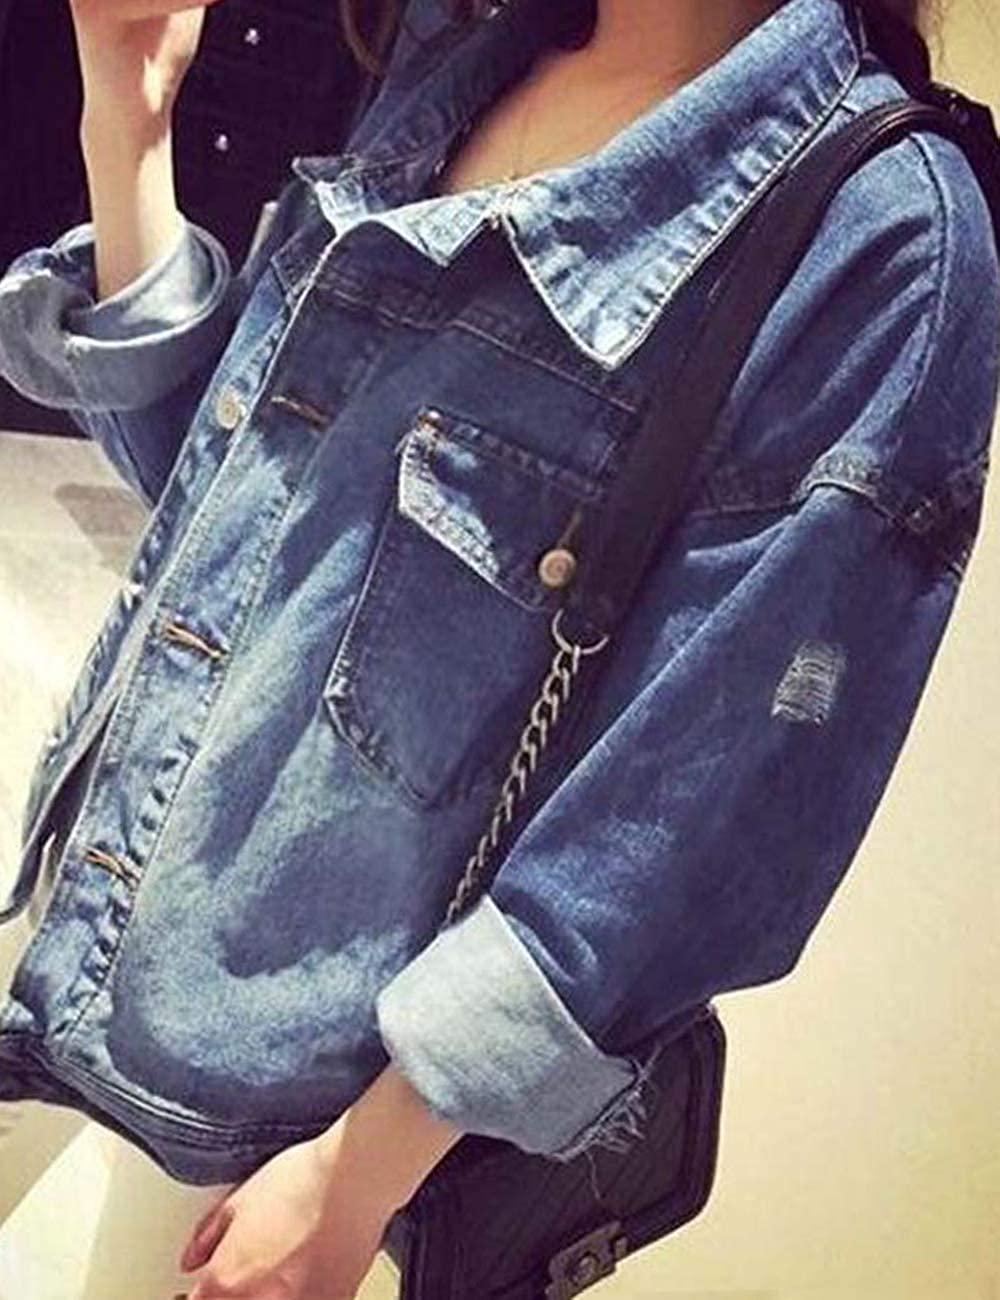 Billie Eilish Jacke Damen Teenager M/ädchen Mode Denim Jacket Frauen Coole Jeans Jacket Pullover Hip Hop Denim Winterjacke Sport J/äckchen Casual Sweatshirt Mantel Outwear Pulli Shirts Tops